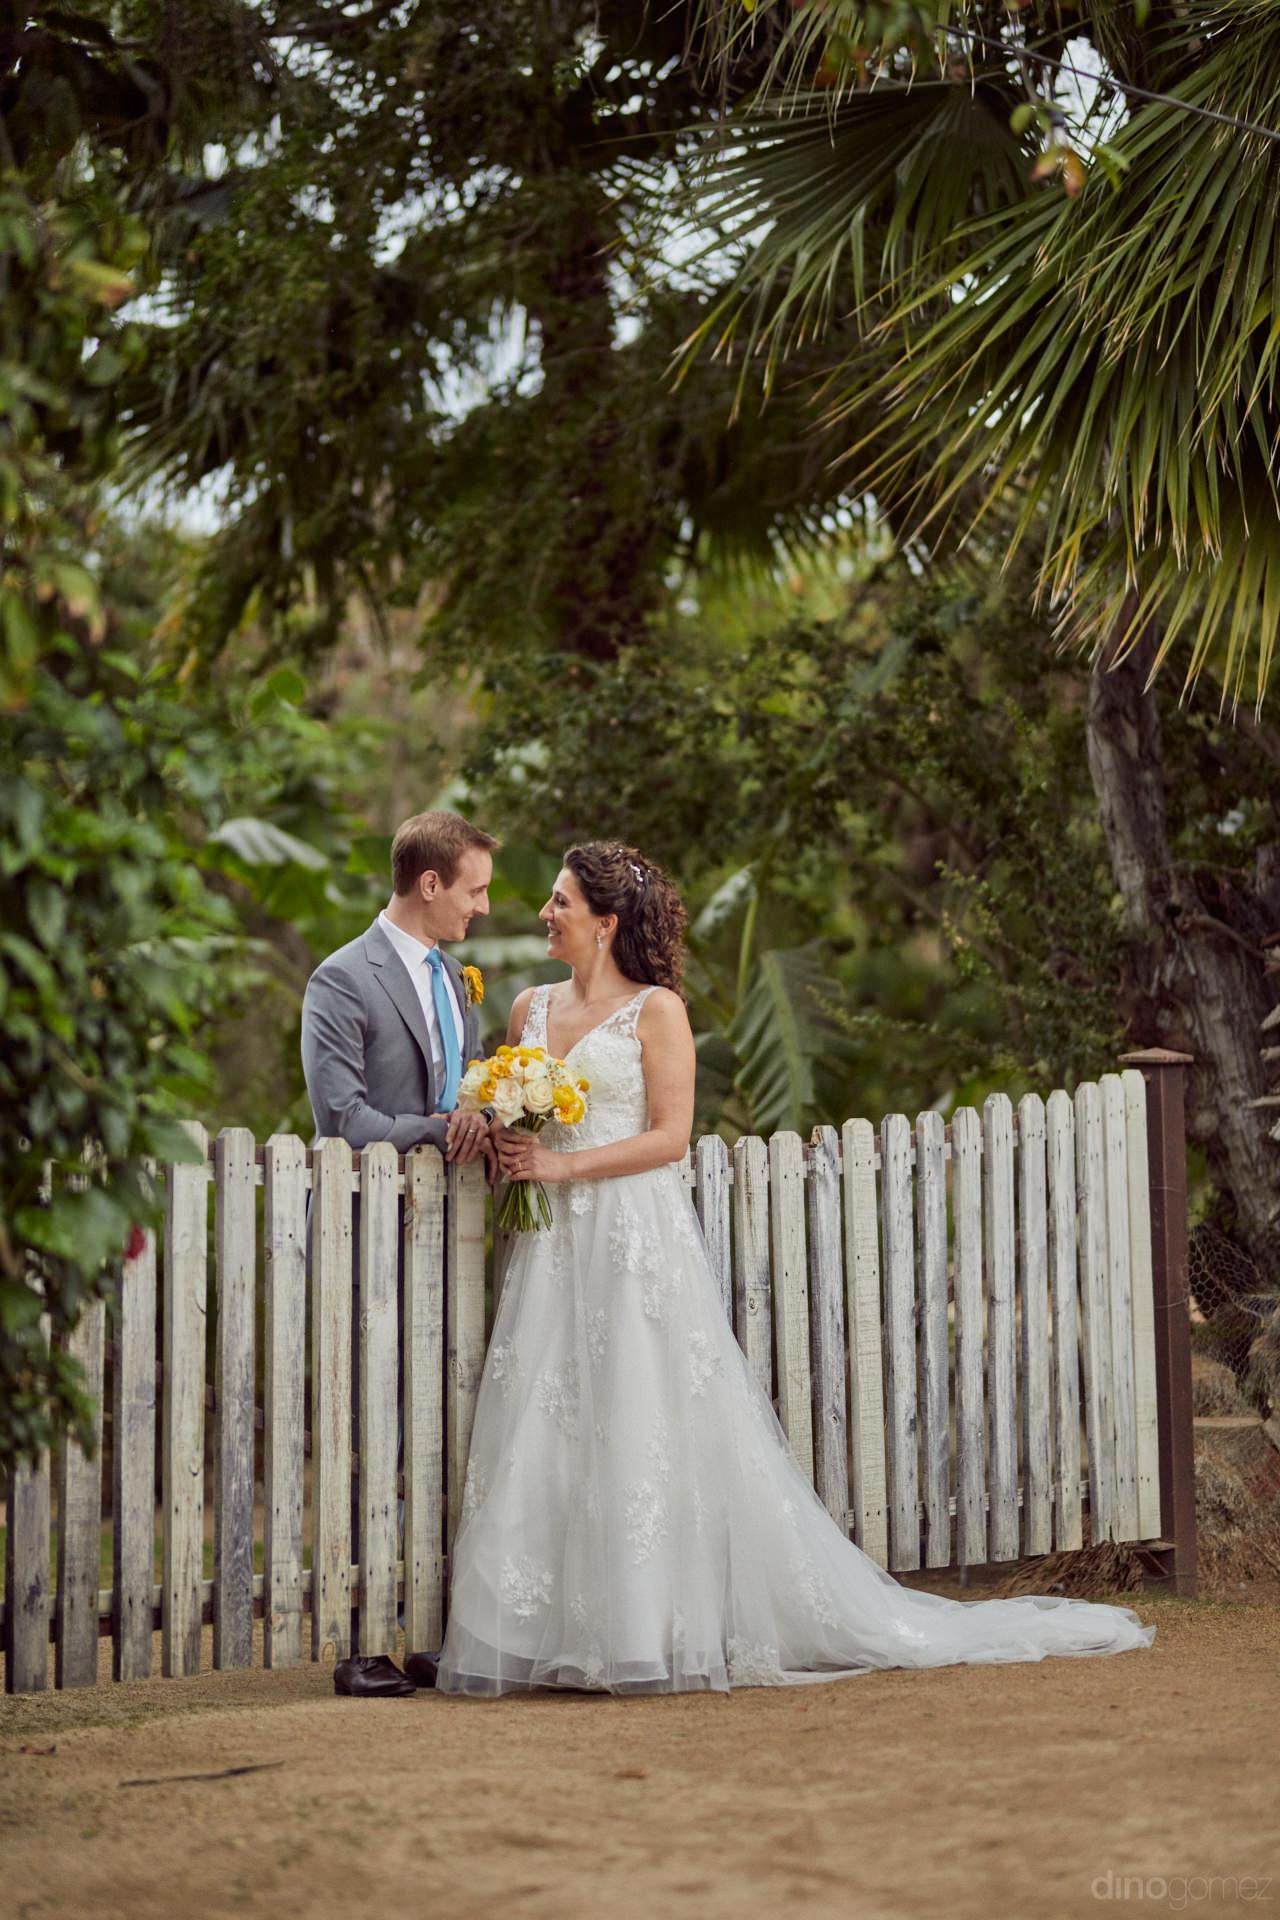 Flora Farms Cabo Wedding Cost - Hilary & Bryan Flora Wedding